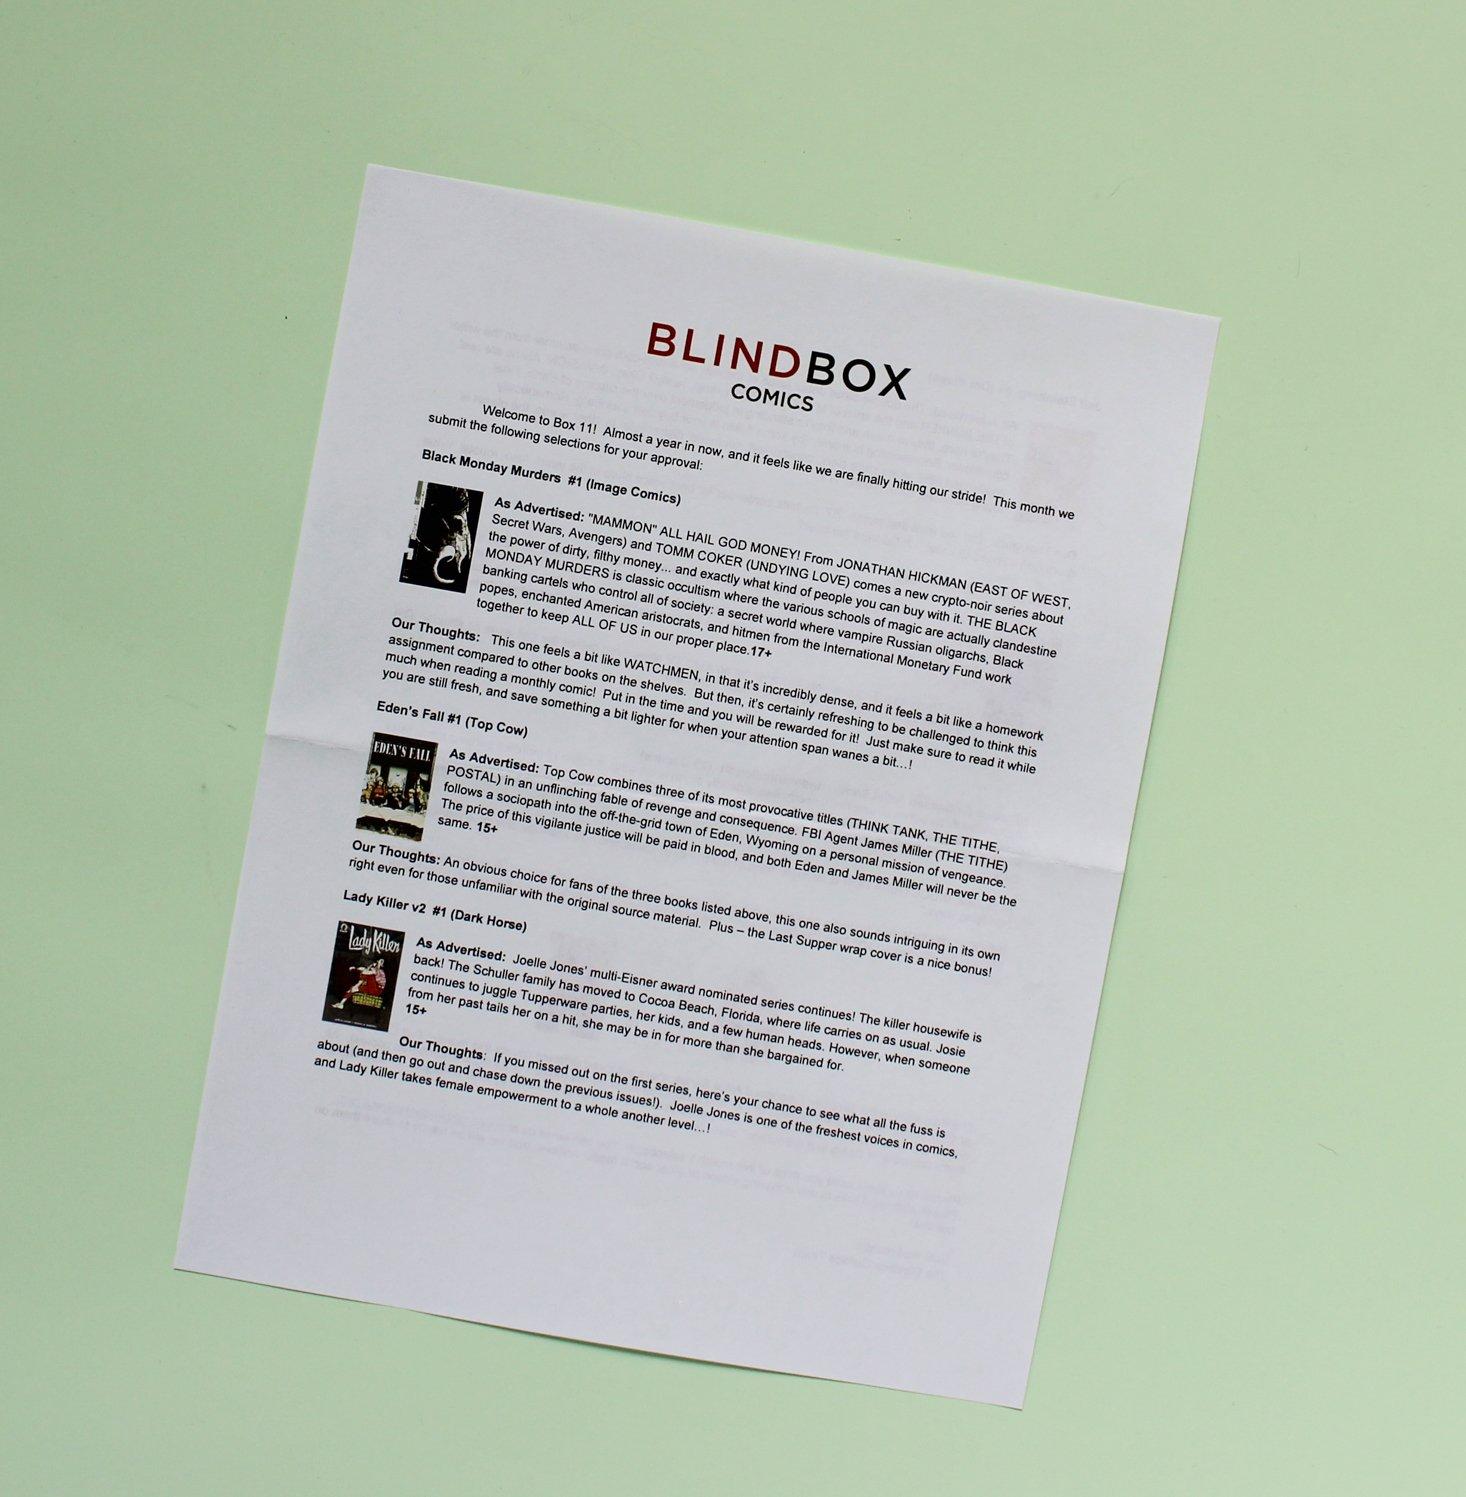 blindbox-comics-september-2016-4